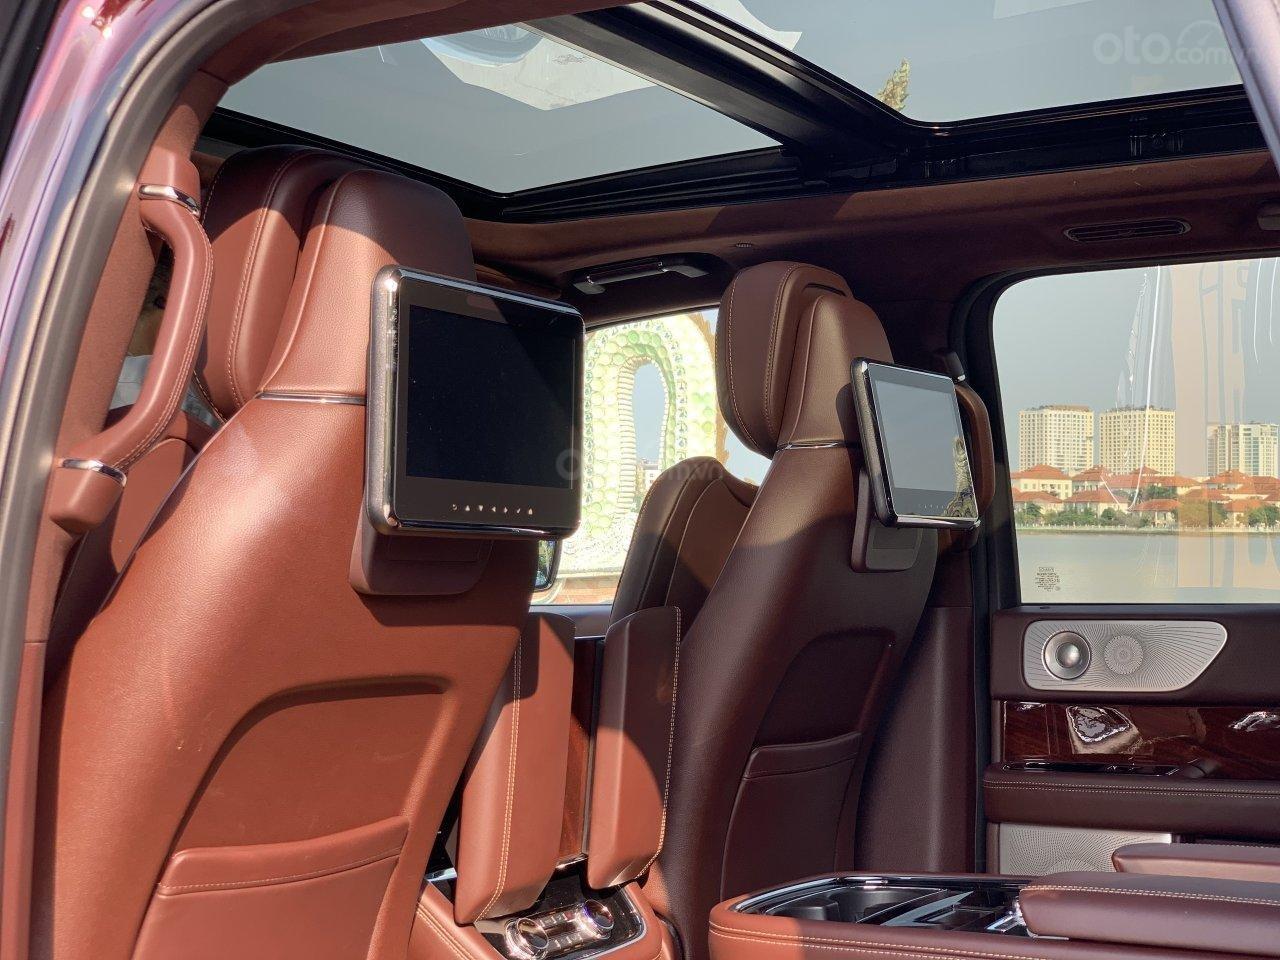 Giao ngay Lincoln Navigator Black Label sản xuất 2019, mới 100%, giá tốt (9)